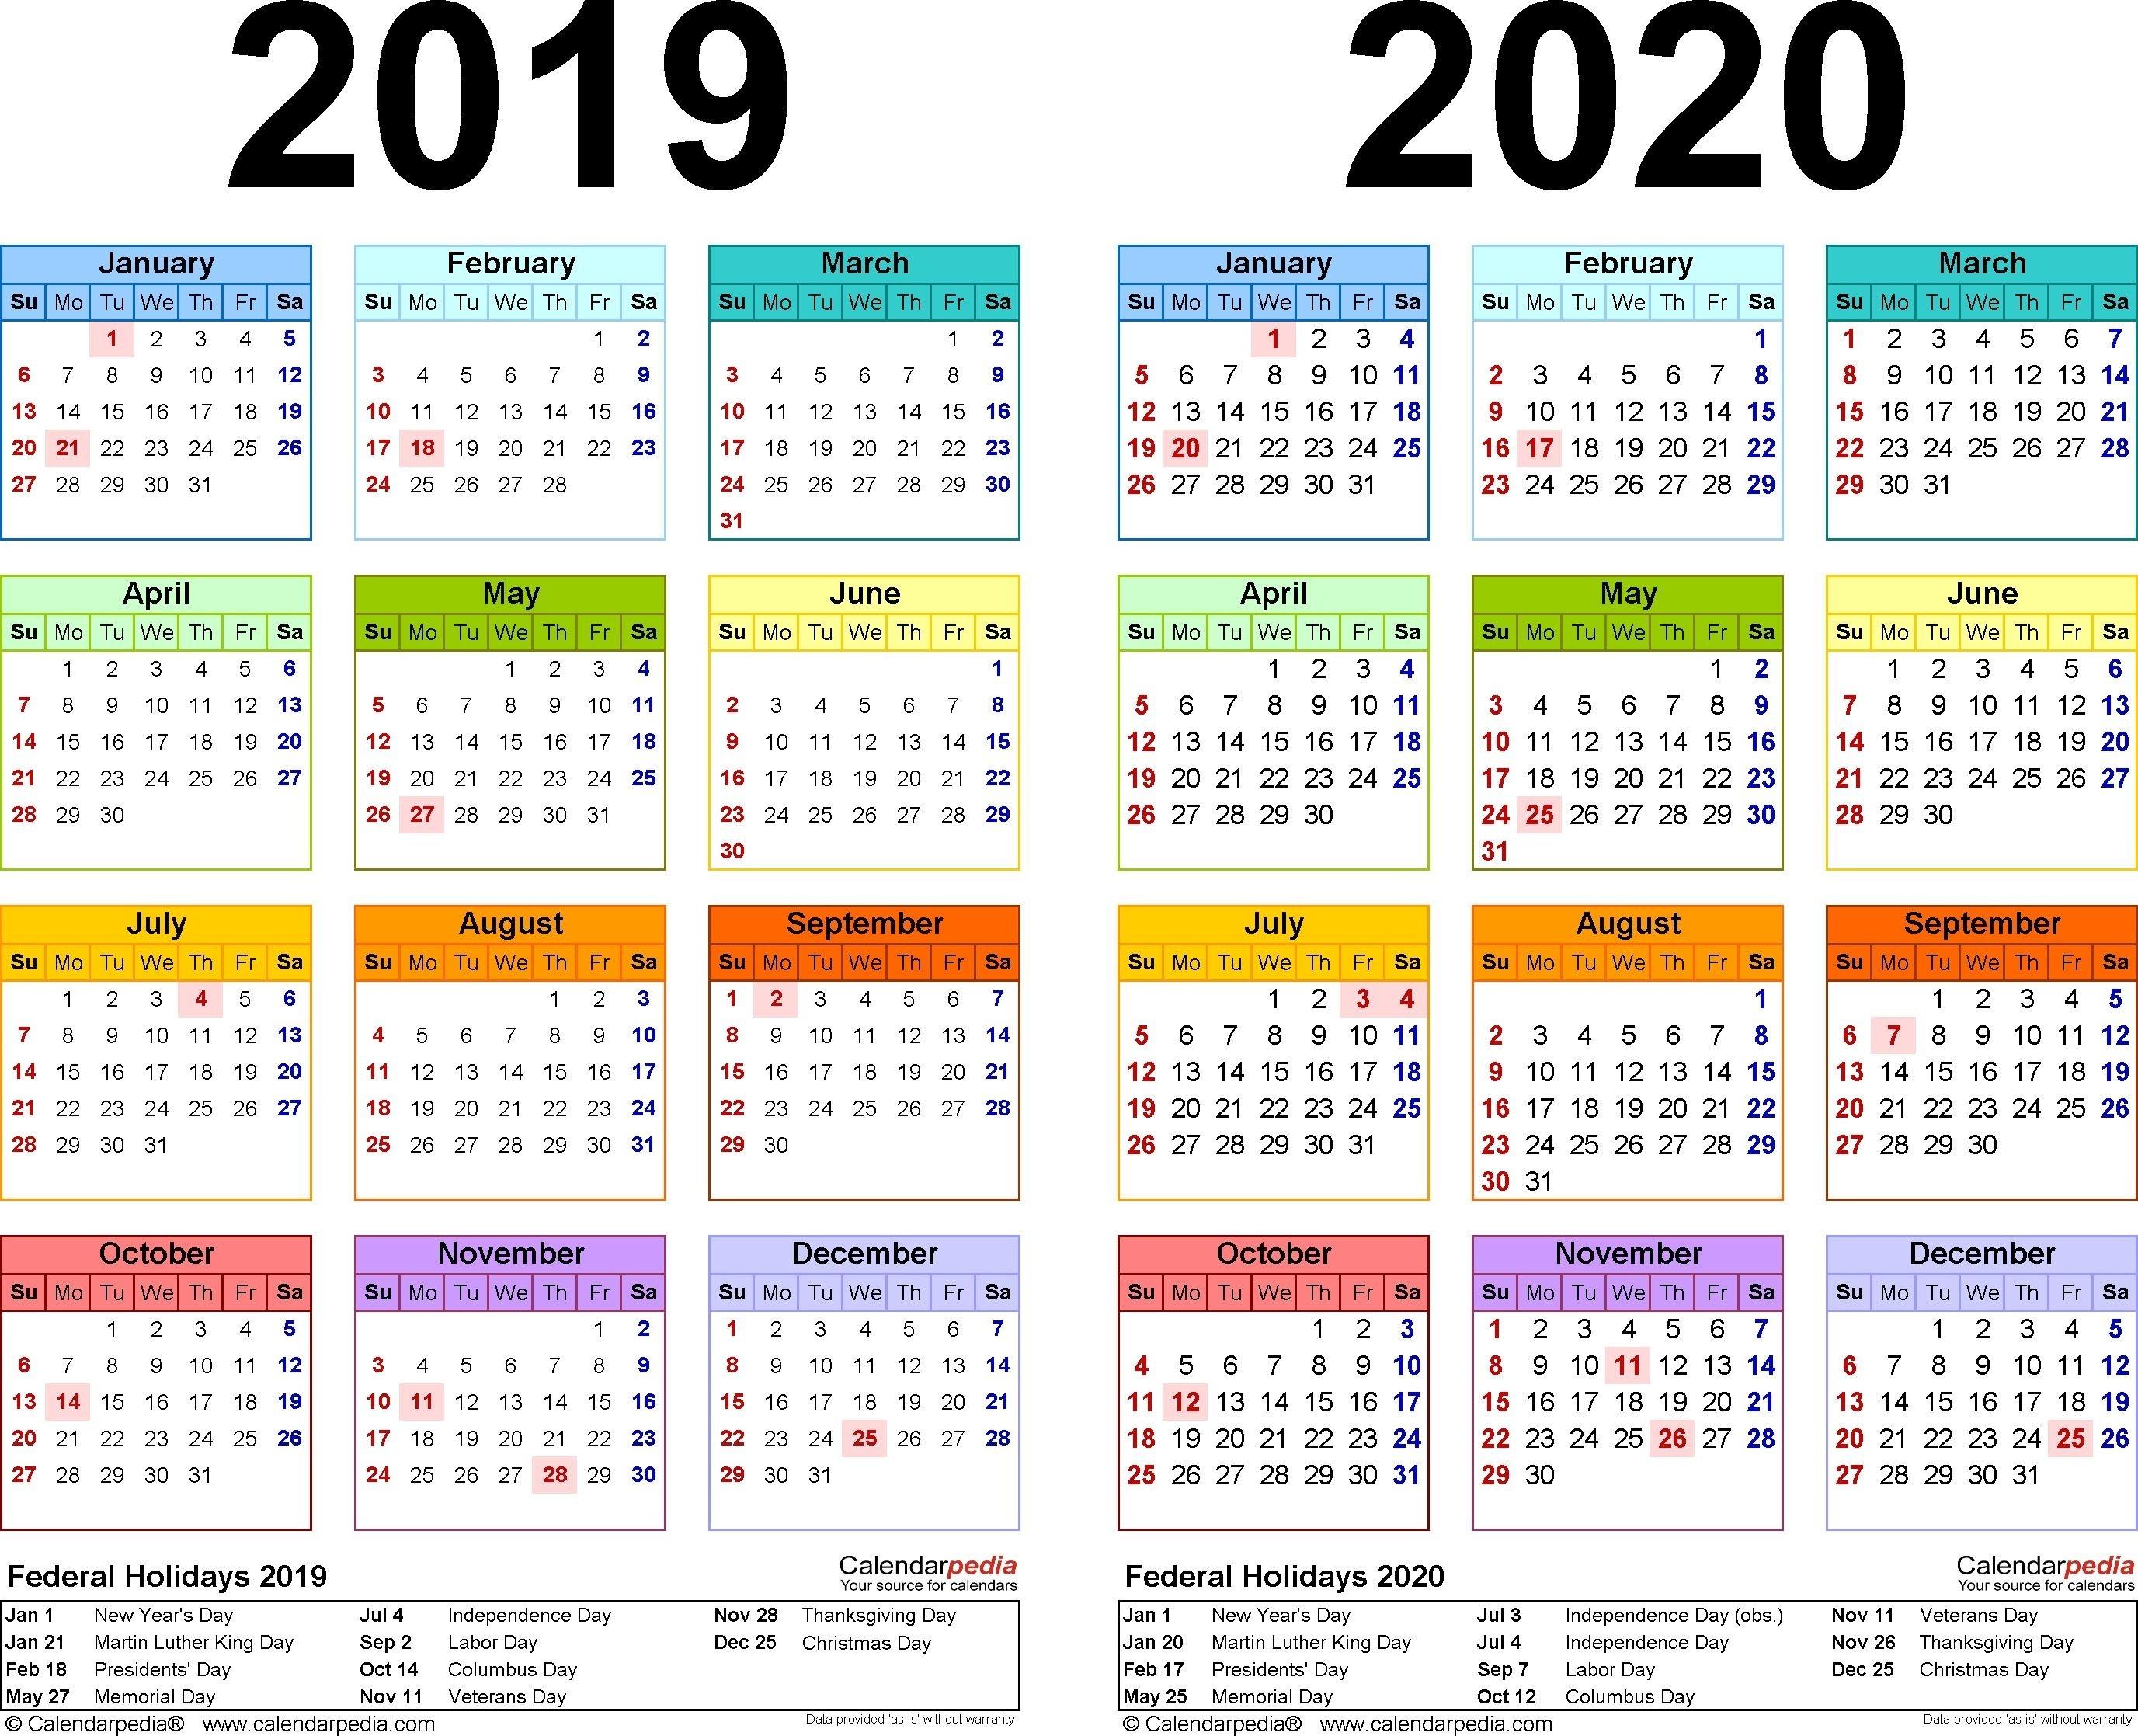 2019-2020 Calendar - Free Printable Two-Year Excel Calendars-Printable 2020 Holidays India